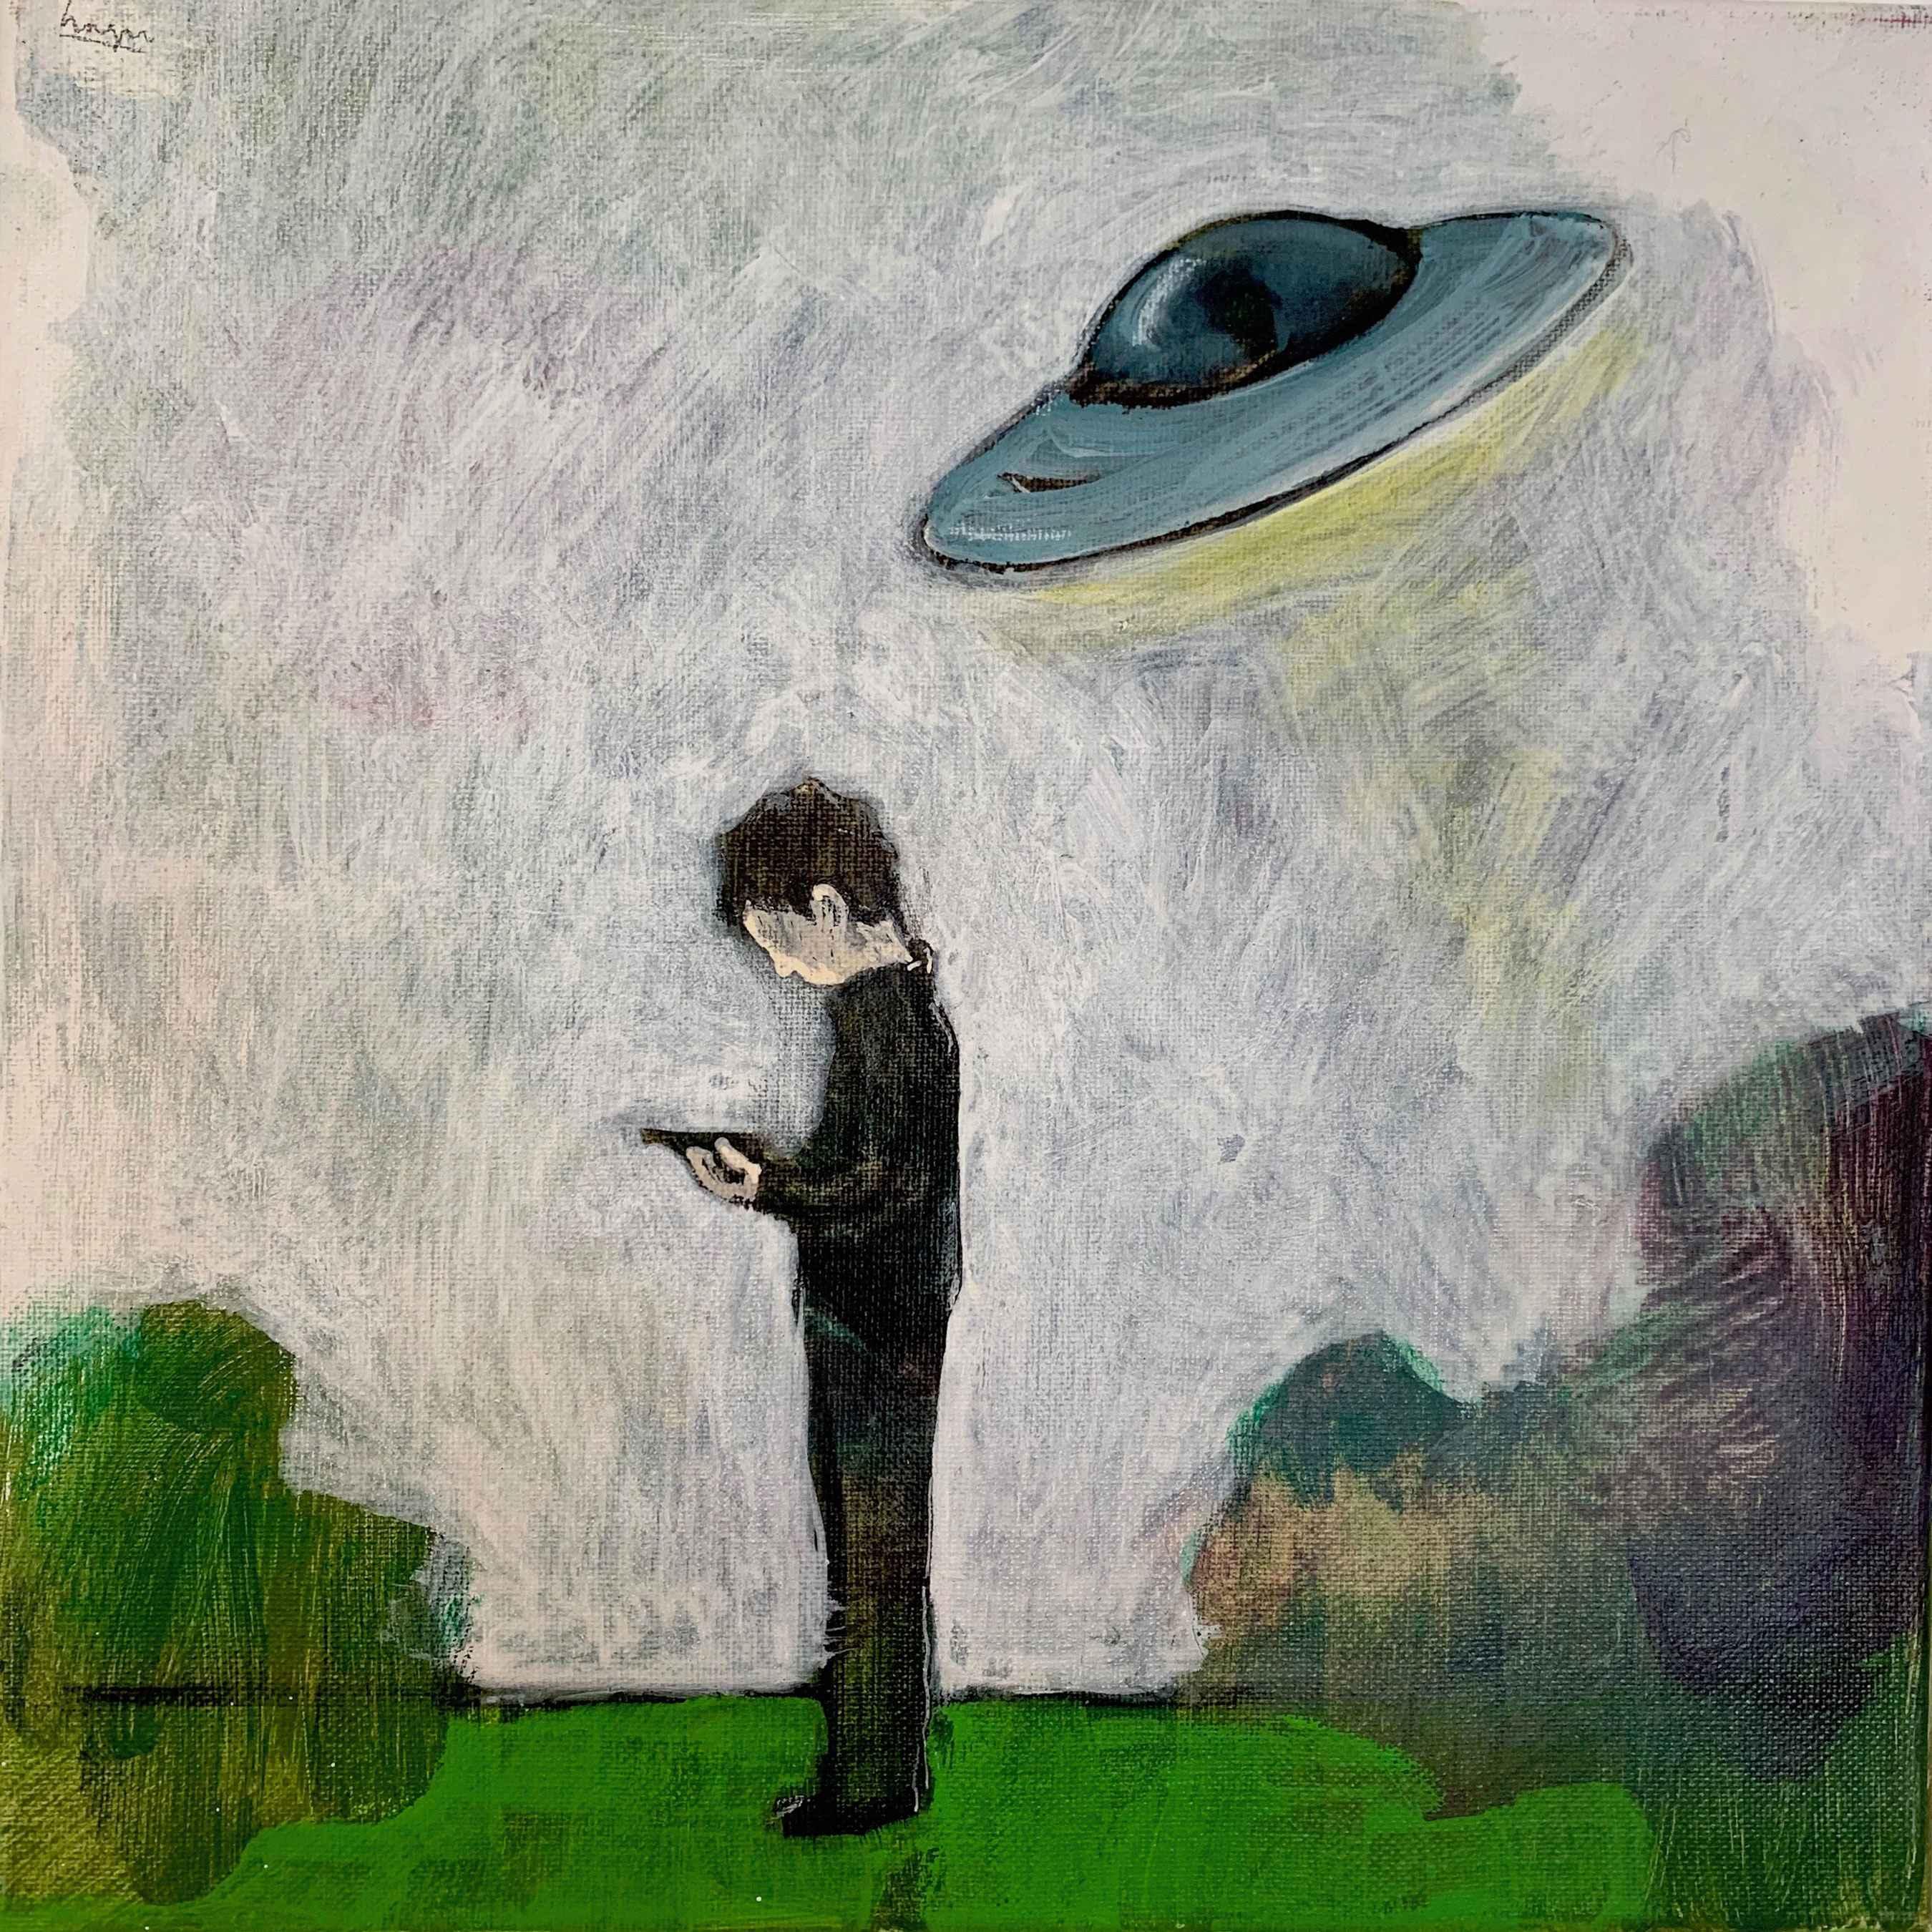 UFO (miss much!) by  Traeger di Pietro - Masterpiece Online